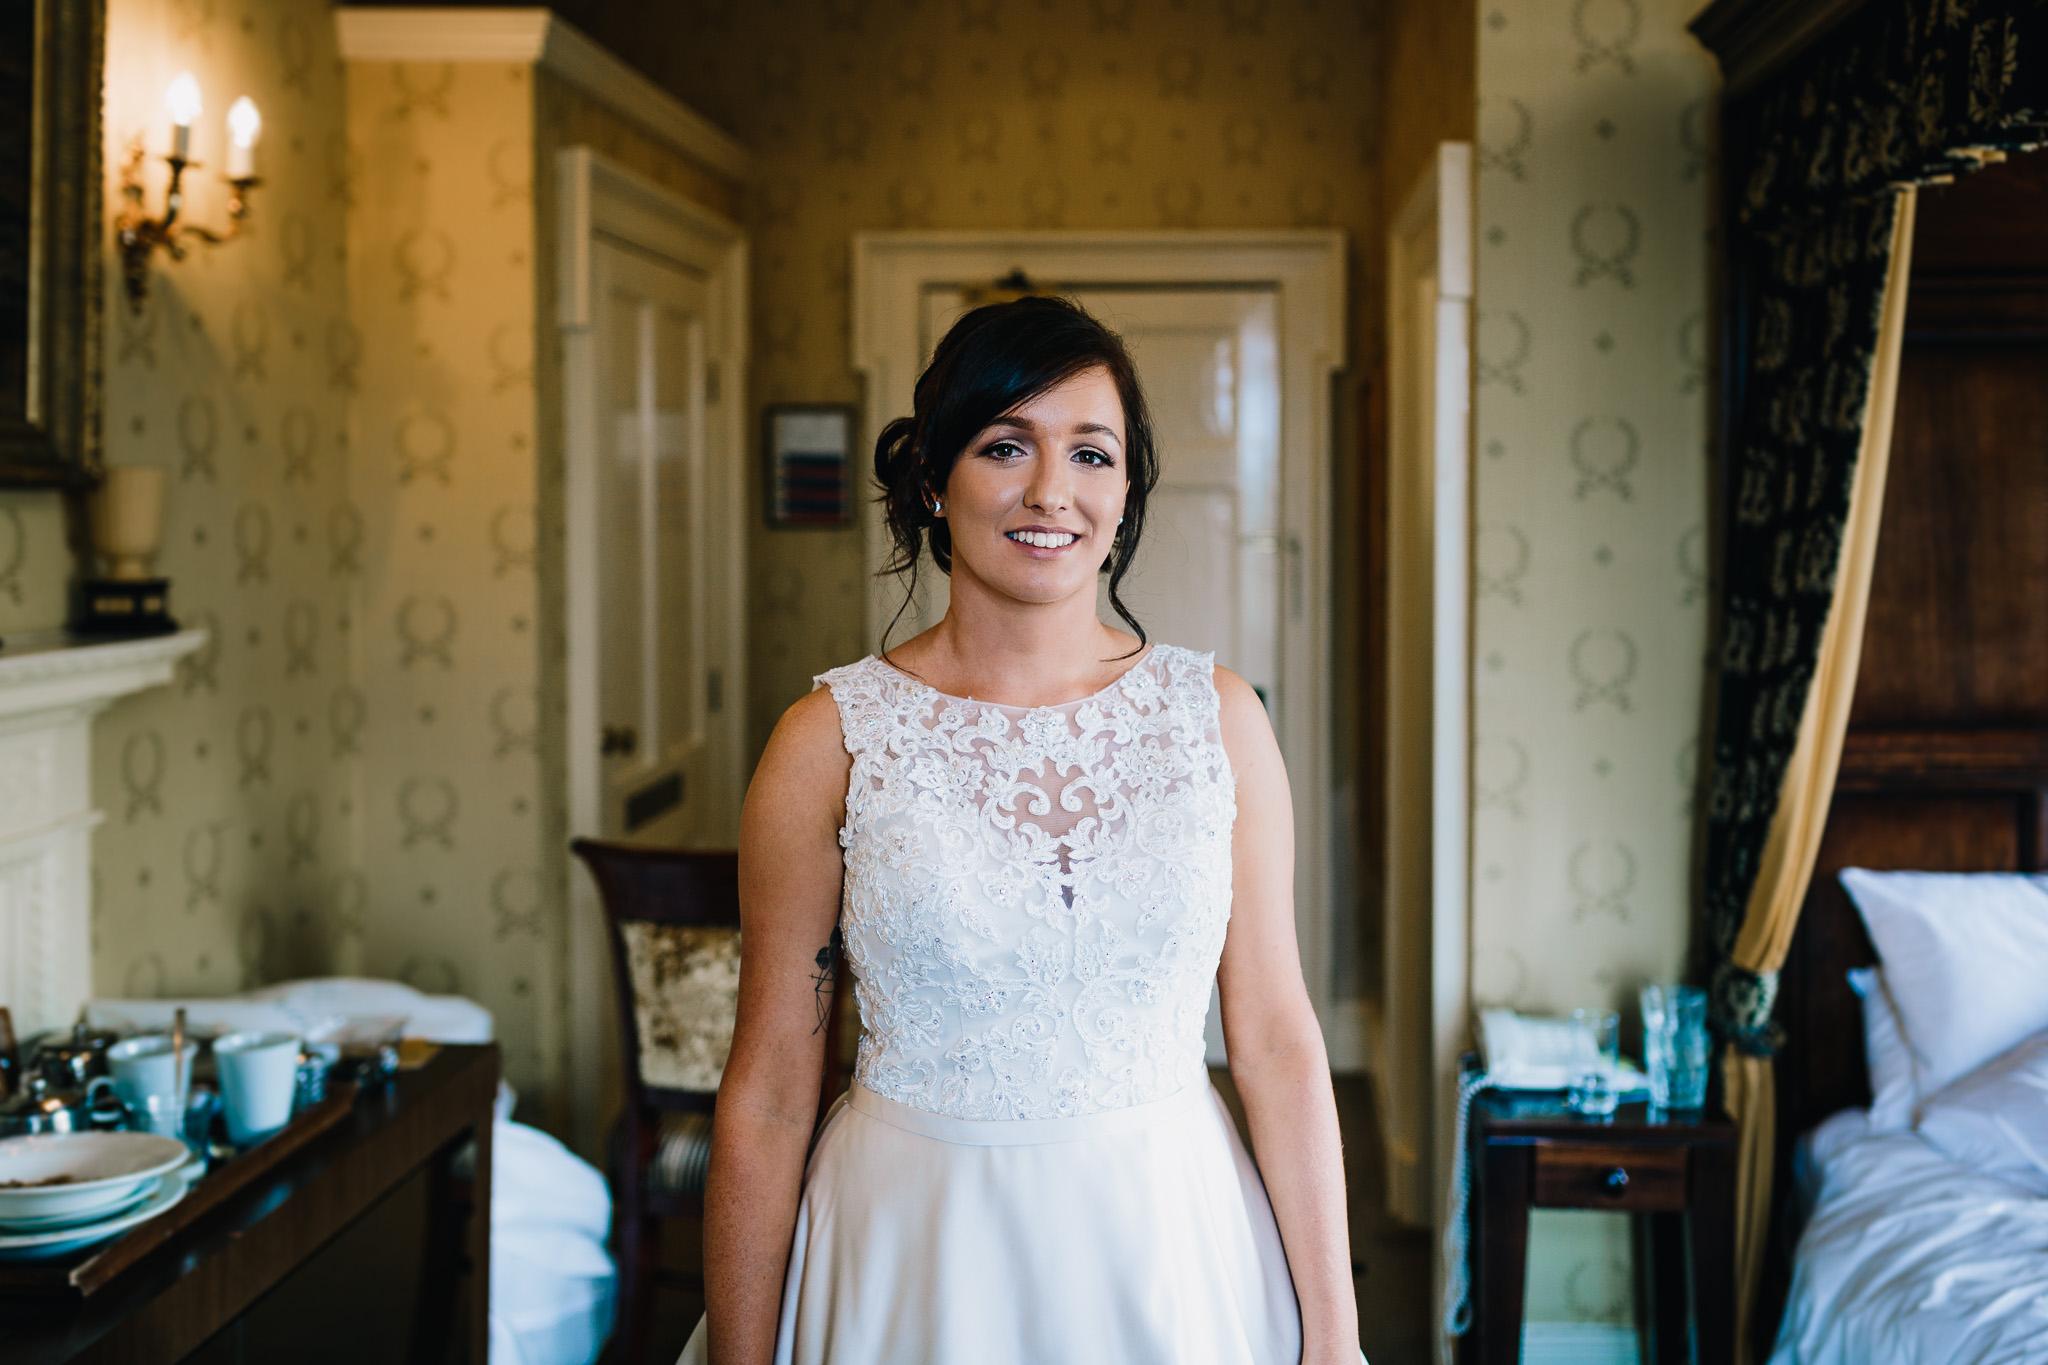 GORGEOUS BRIDE IN WEDDING DRESS BRIDAL PREP